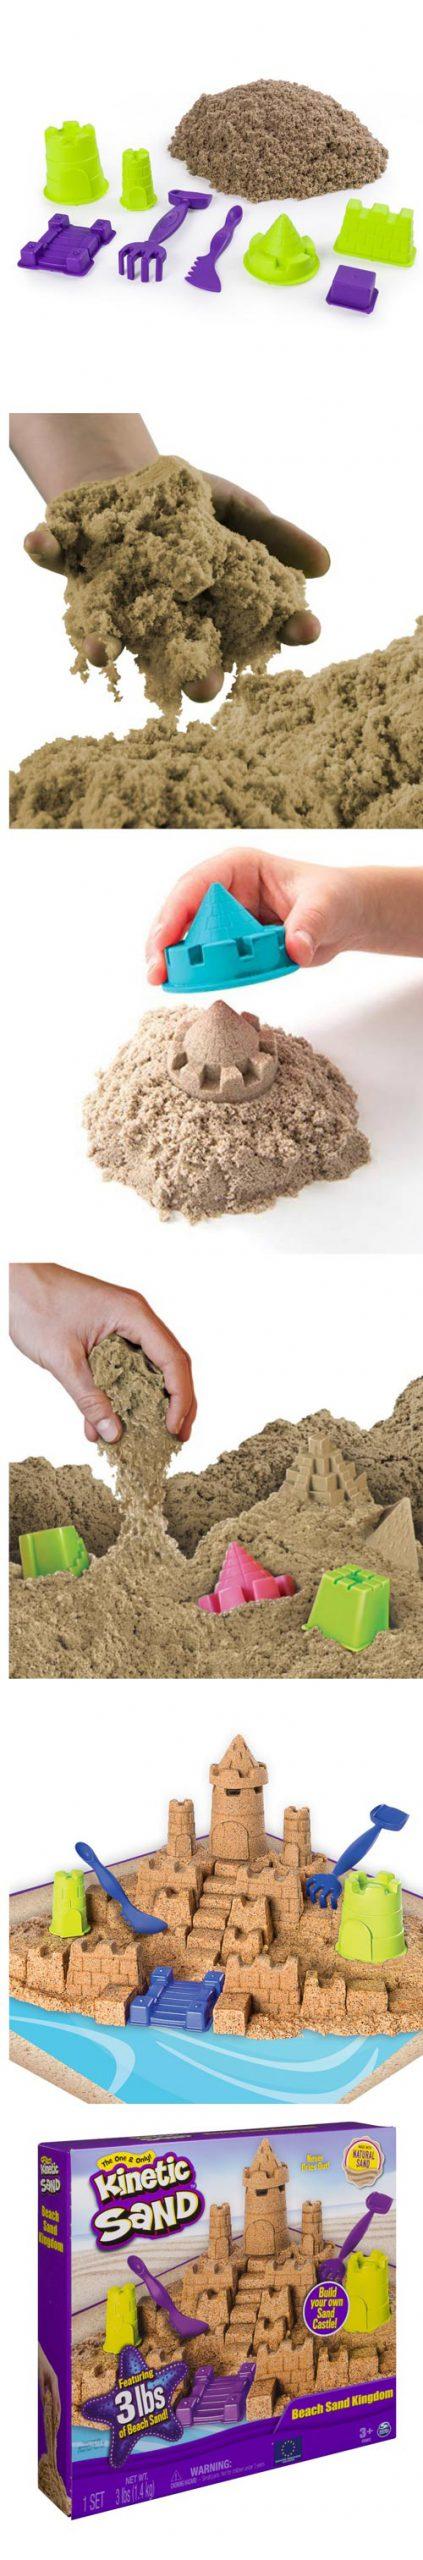 Kinetic Sand Play Set In Pakistan